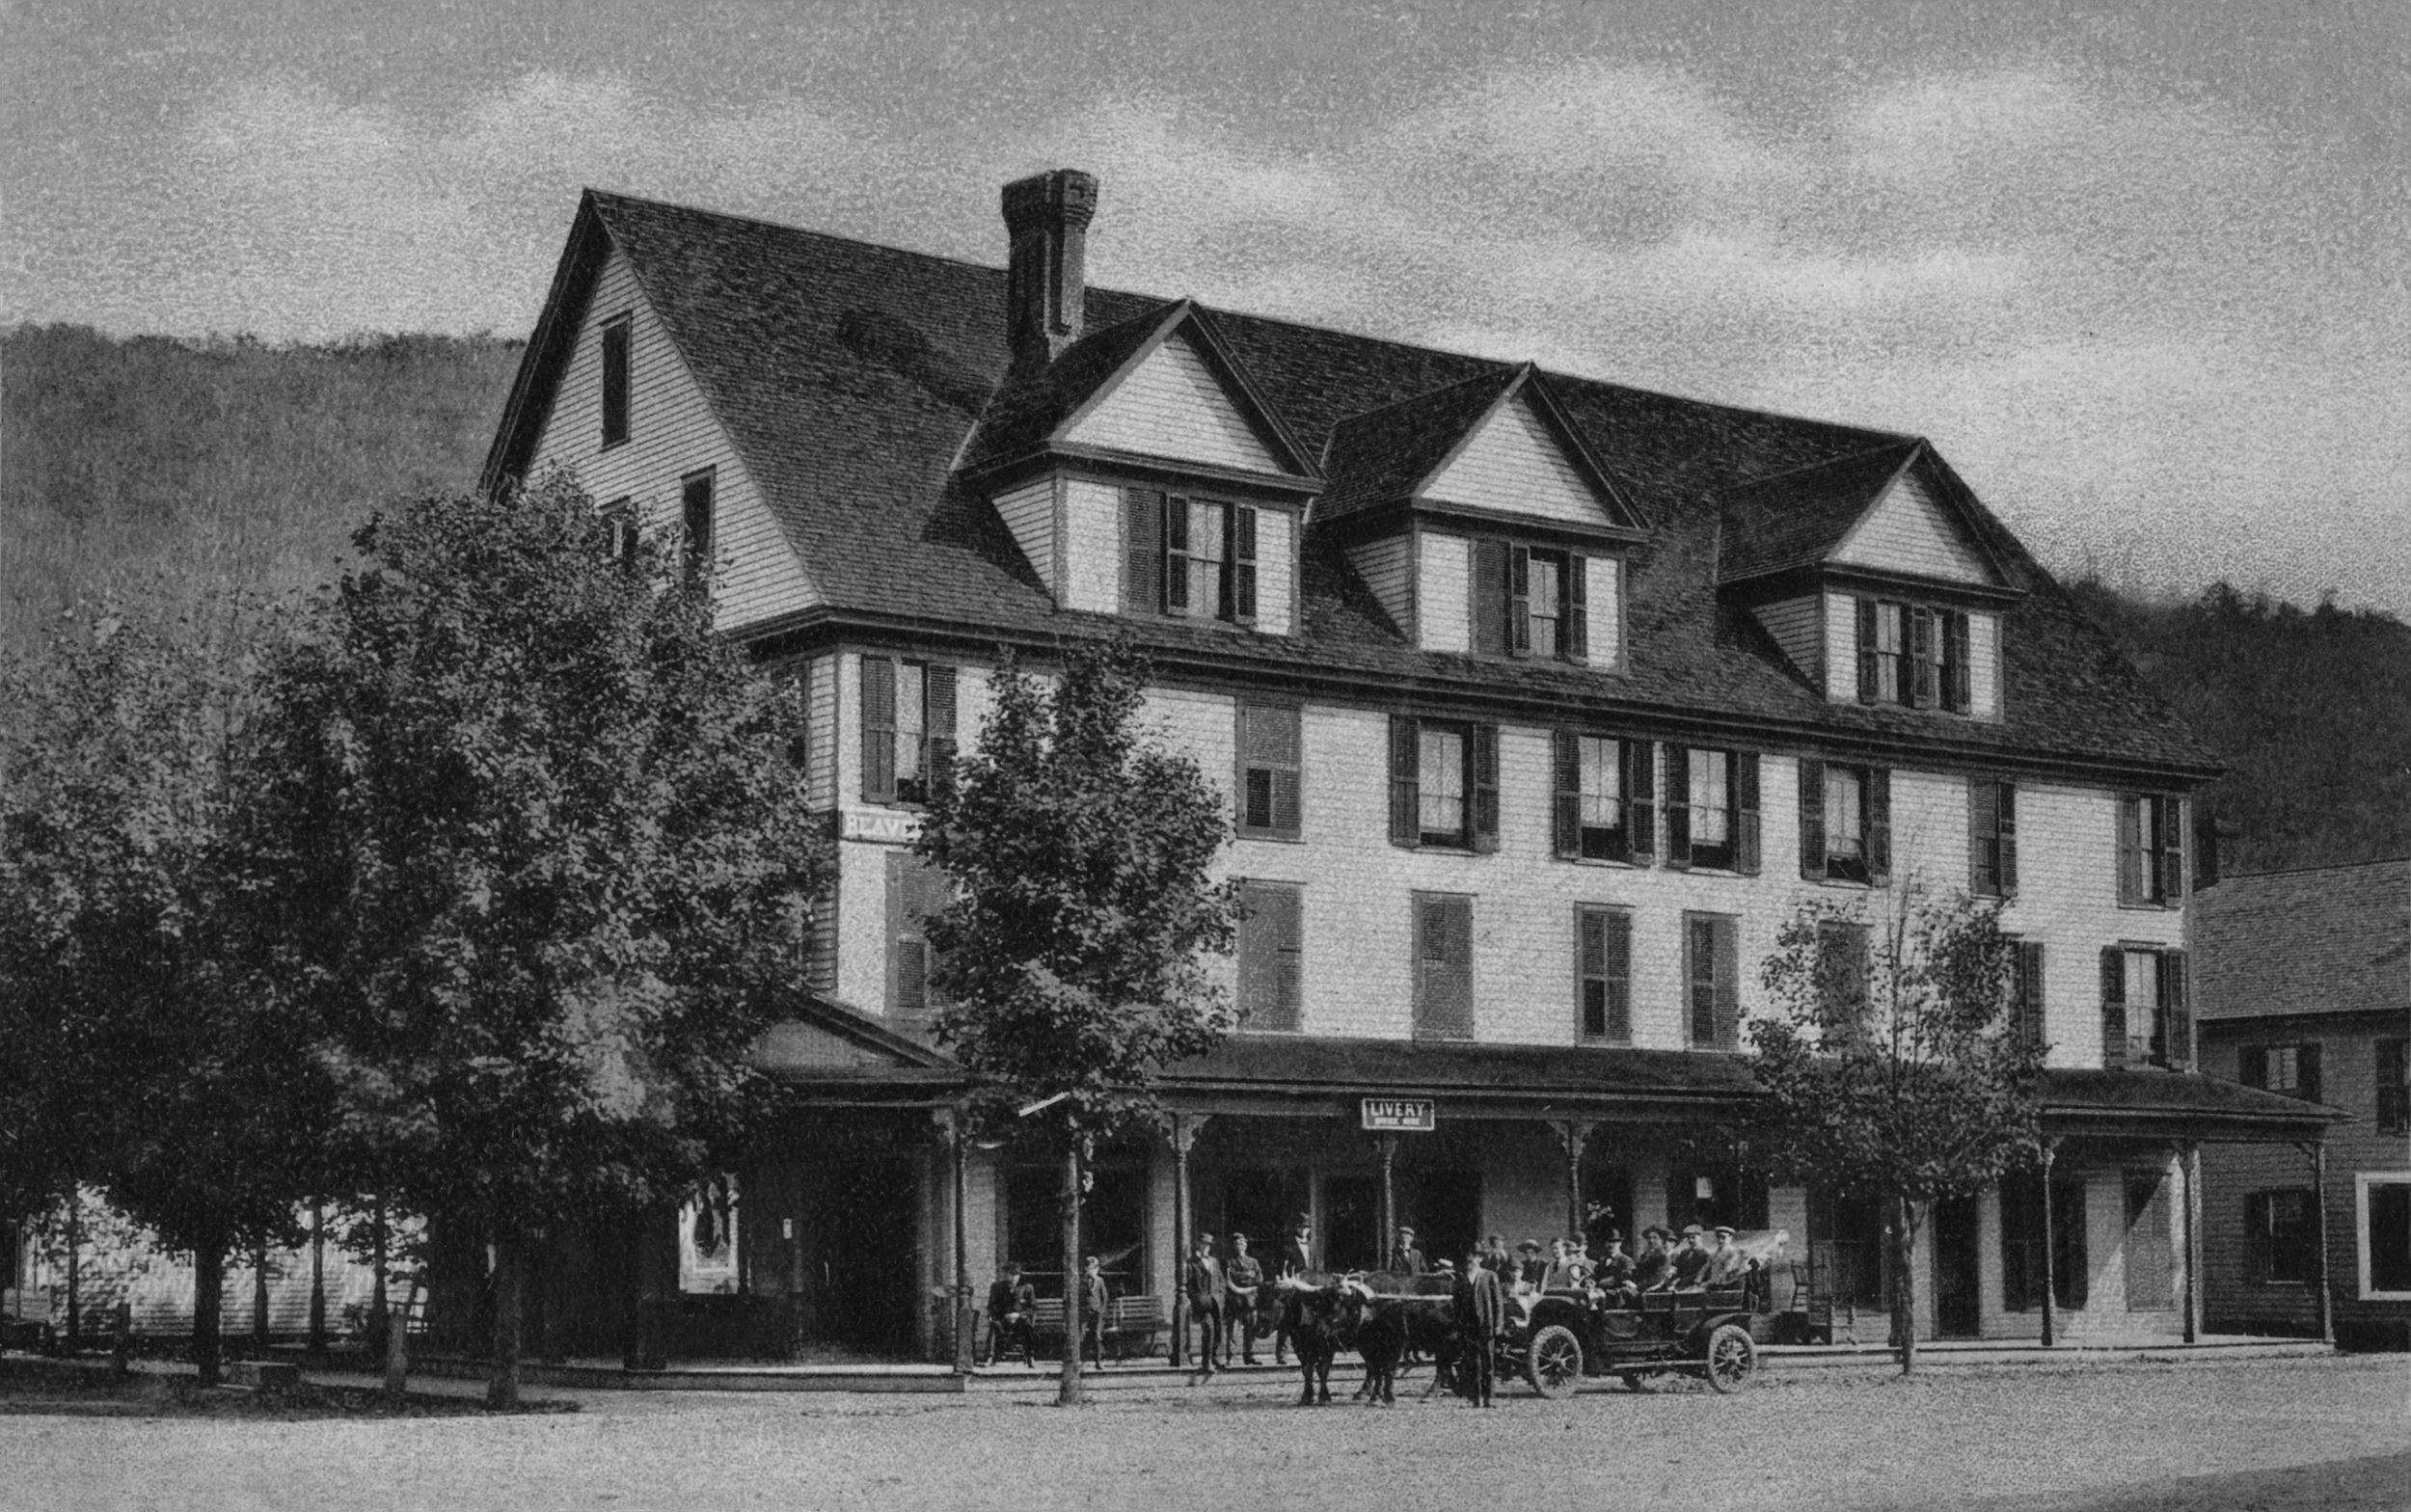 The Beaverkill House courtesy Ed Van Put